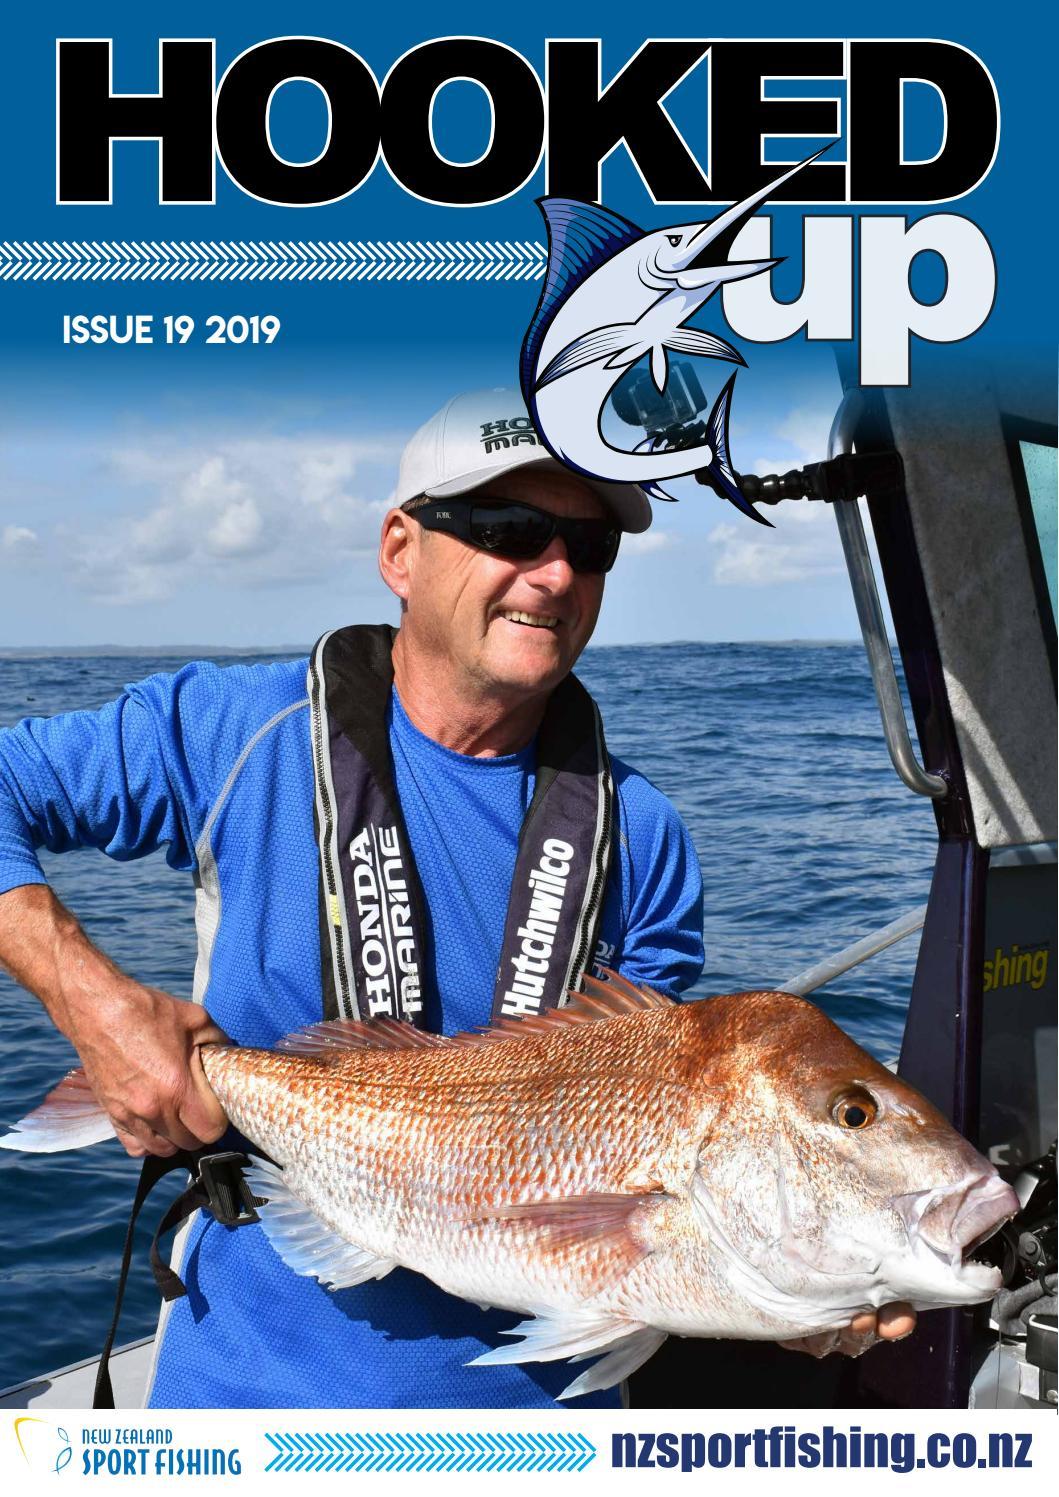 Fisherman Angler T-Shirt I/'m Busy Not Catching Anything Fishing